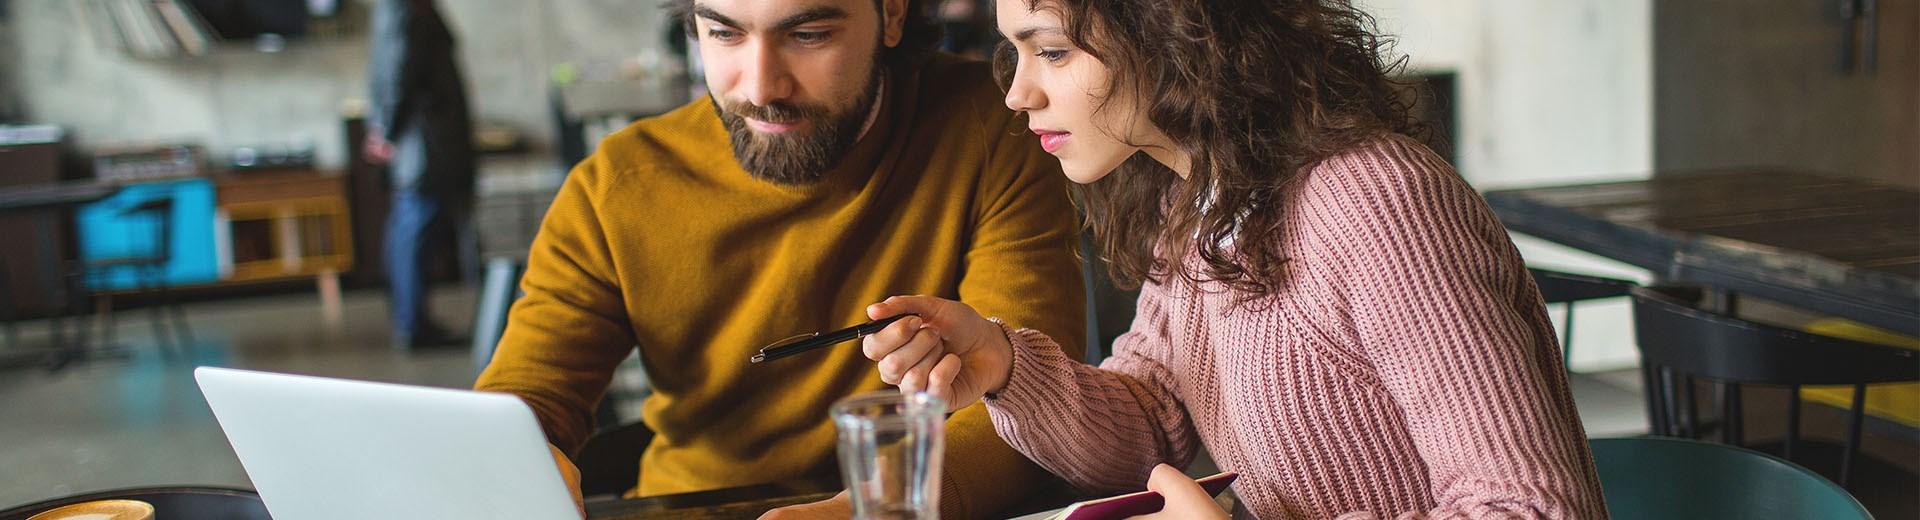 Varoitus merkki online dating